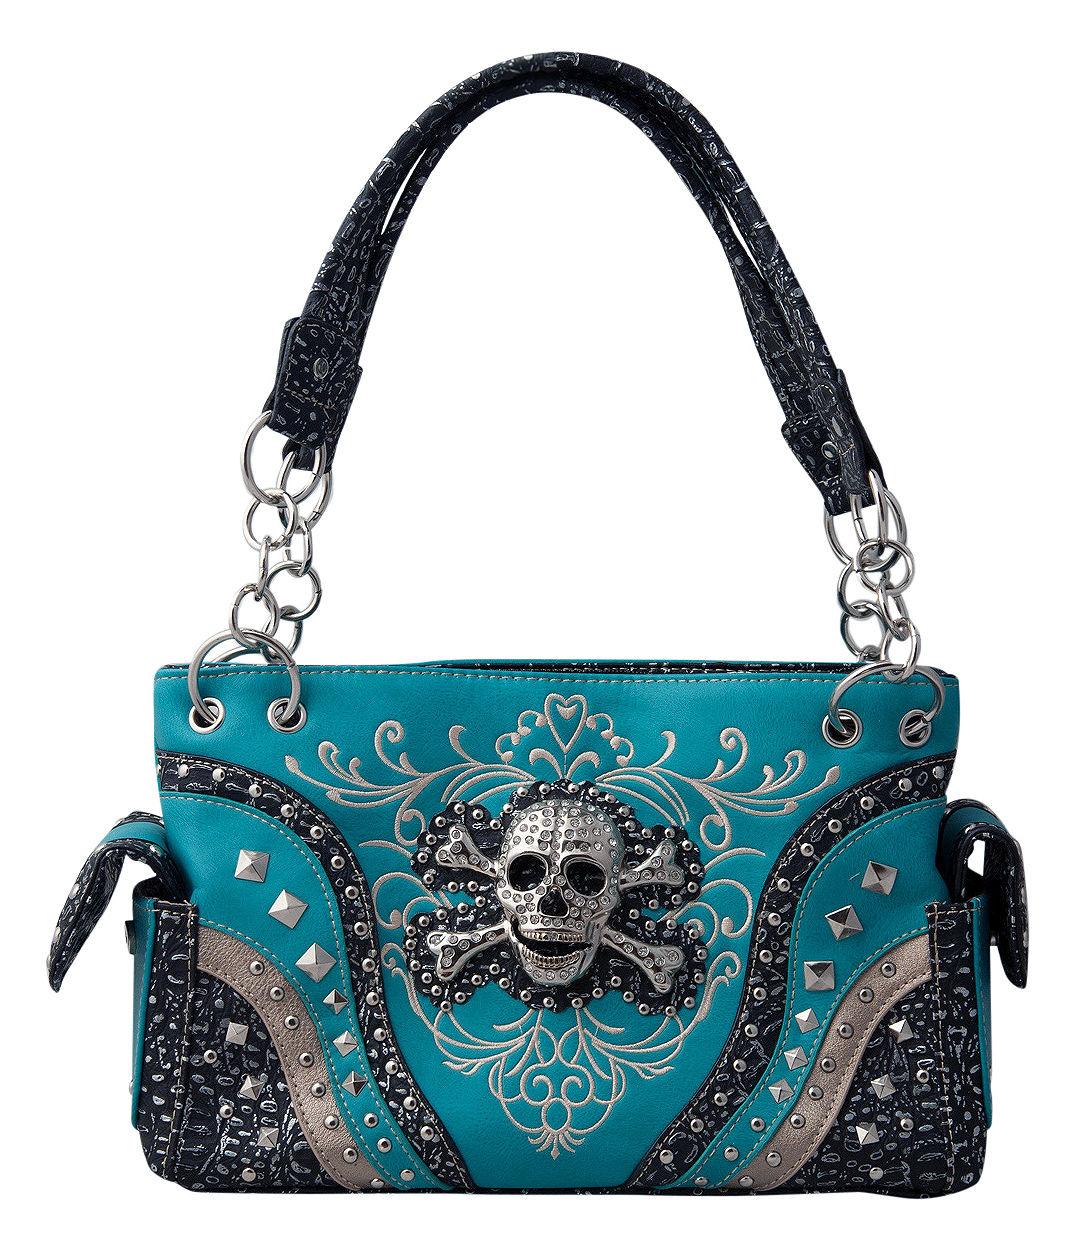 66425ad4357c Skull Studded Rhinestone Embroidered Conceal Carry Shoulder Handbag